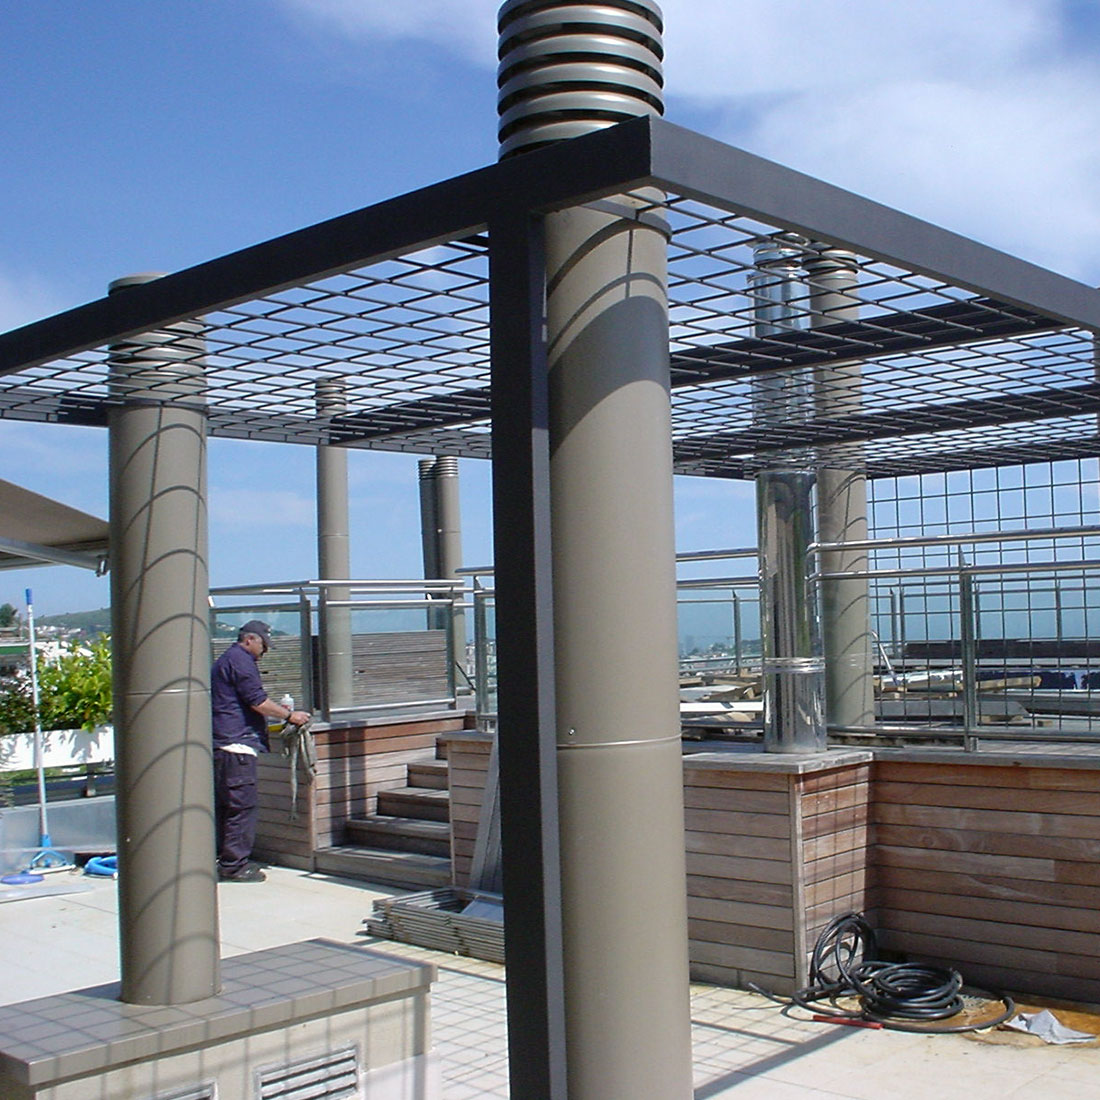 proyectos de arquitectura -fugrup-particular-metal-pergola-verano